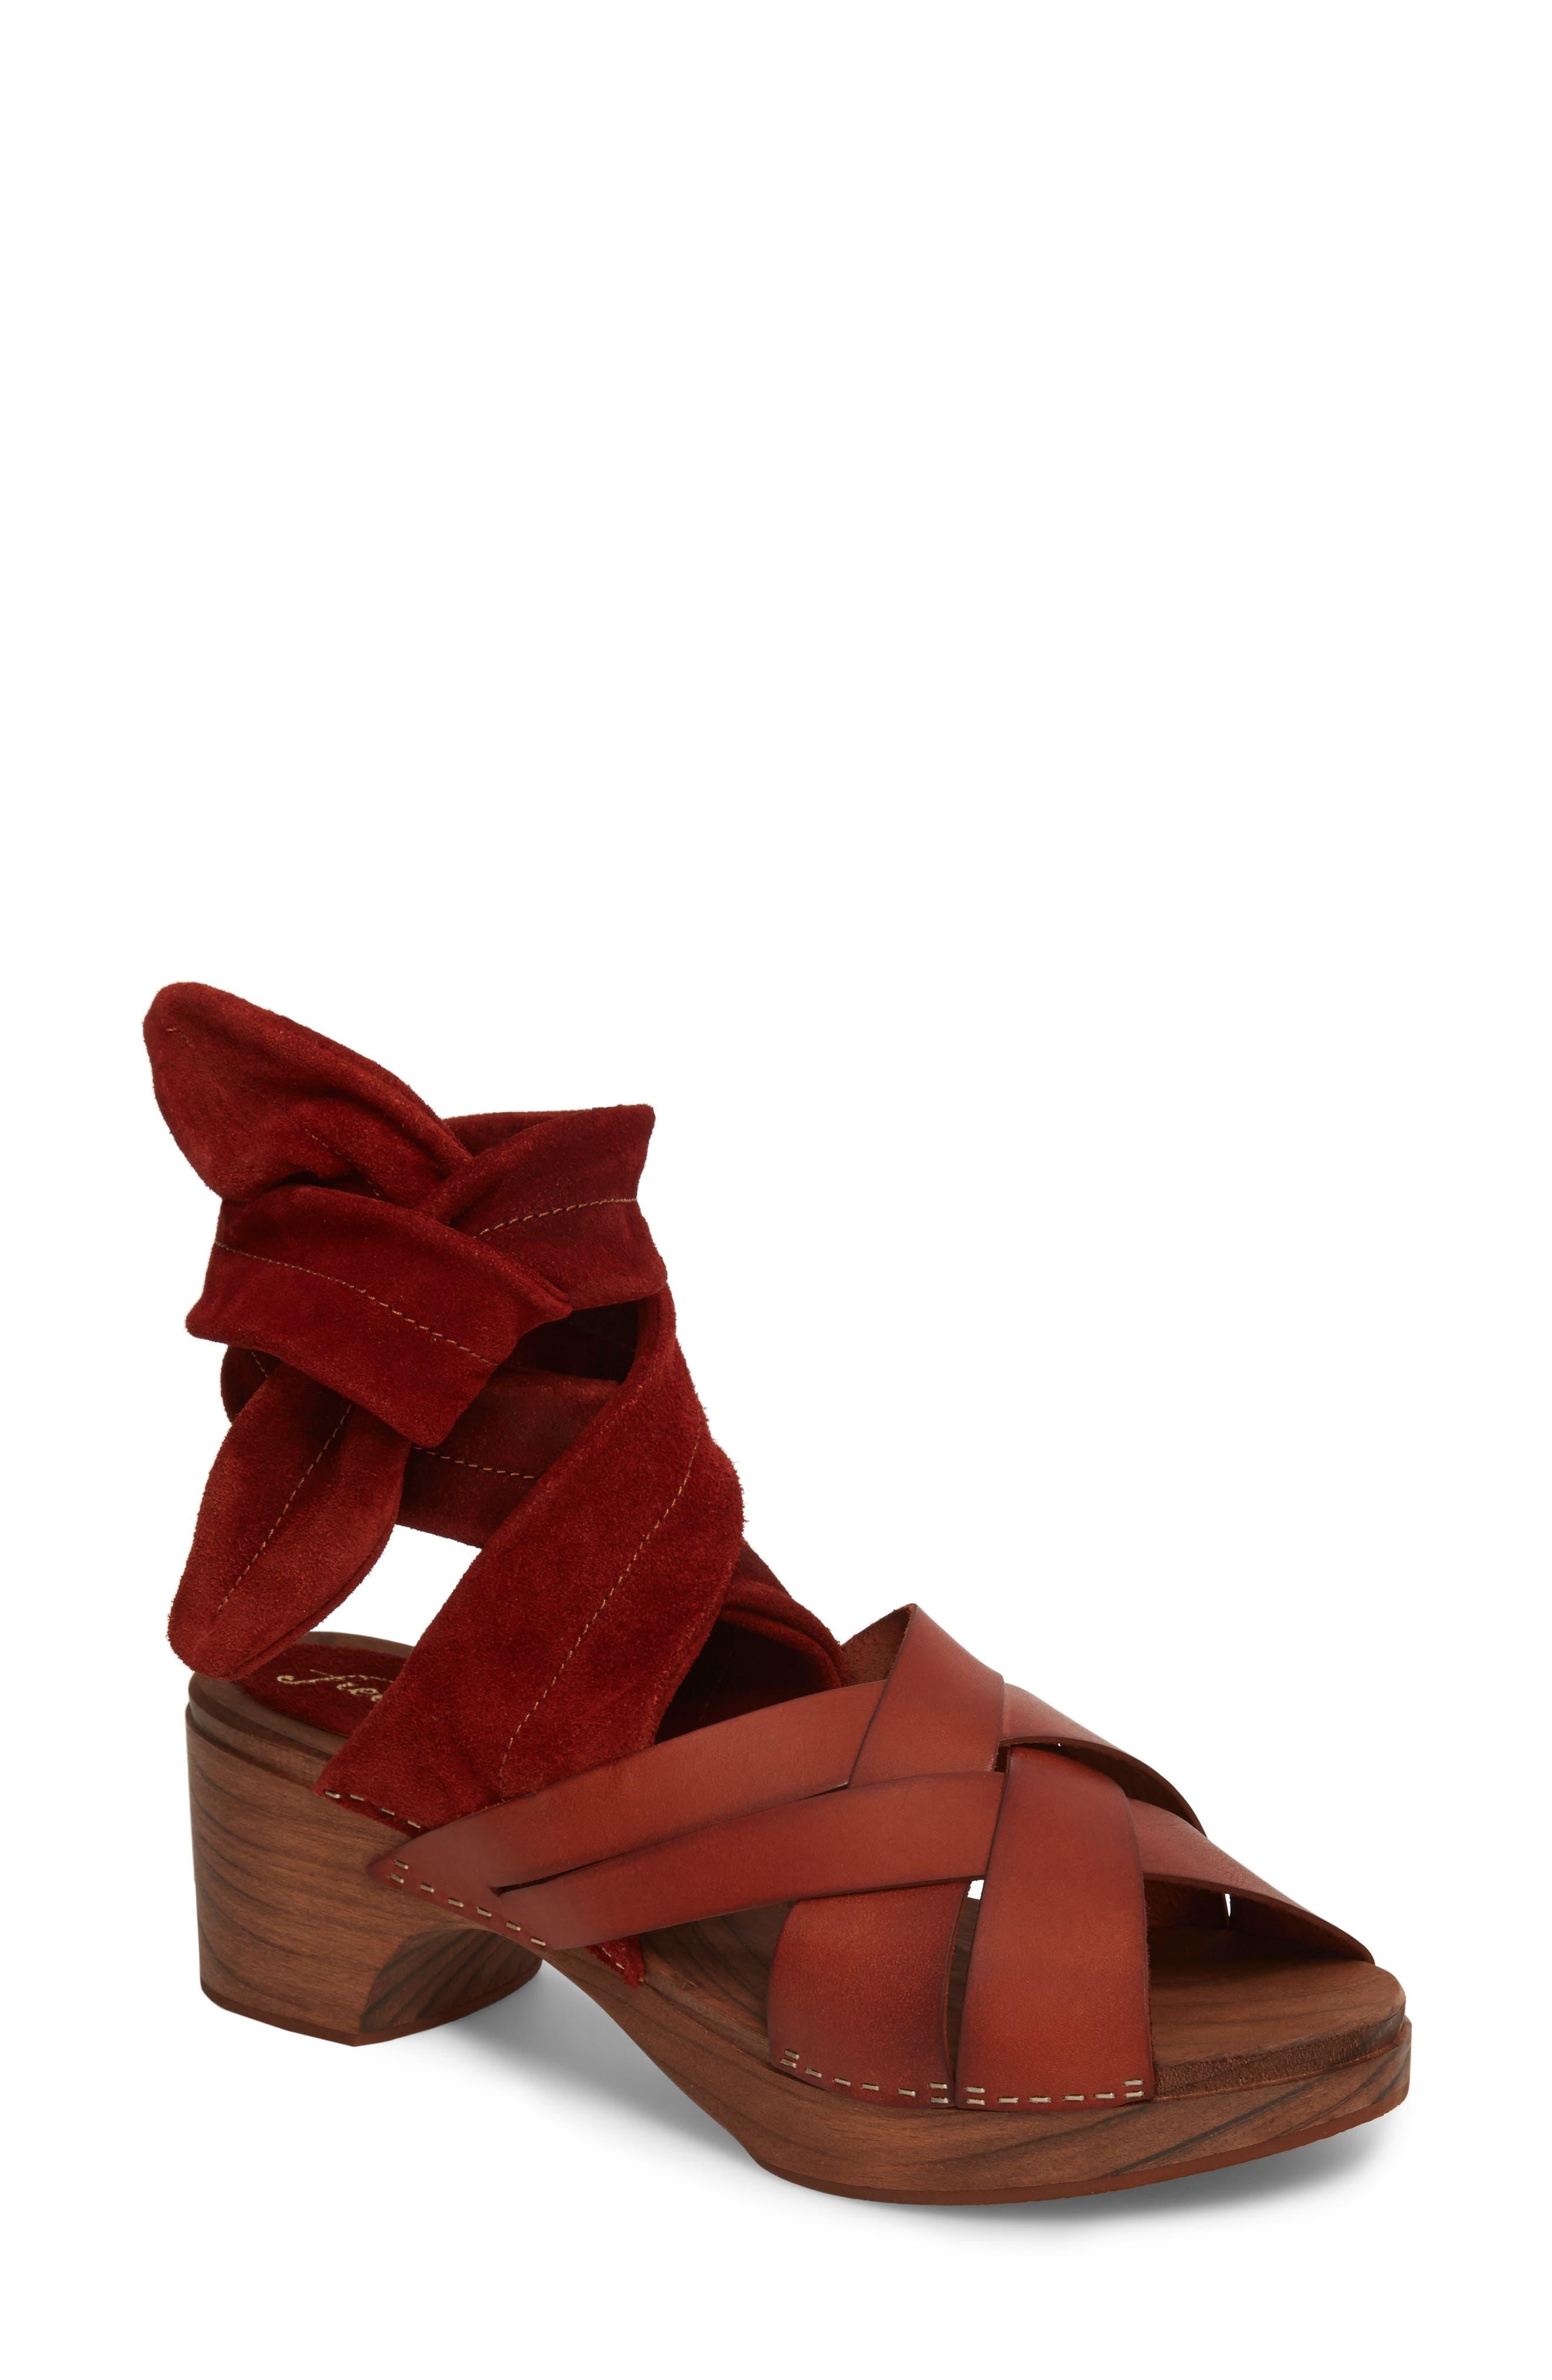 Emmy Ankle Wrap Sandal,                         Main,                         color, Brown